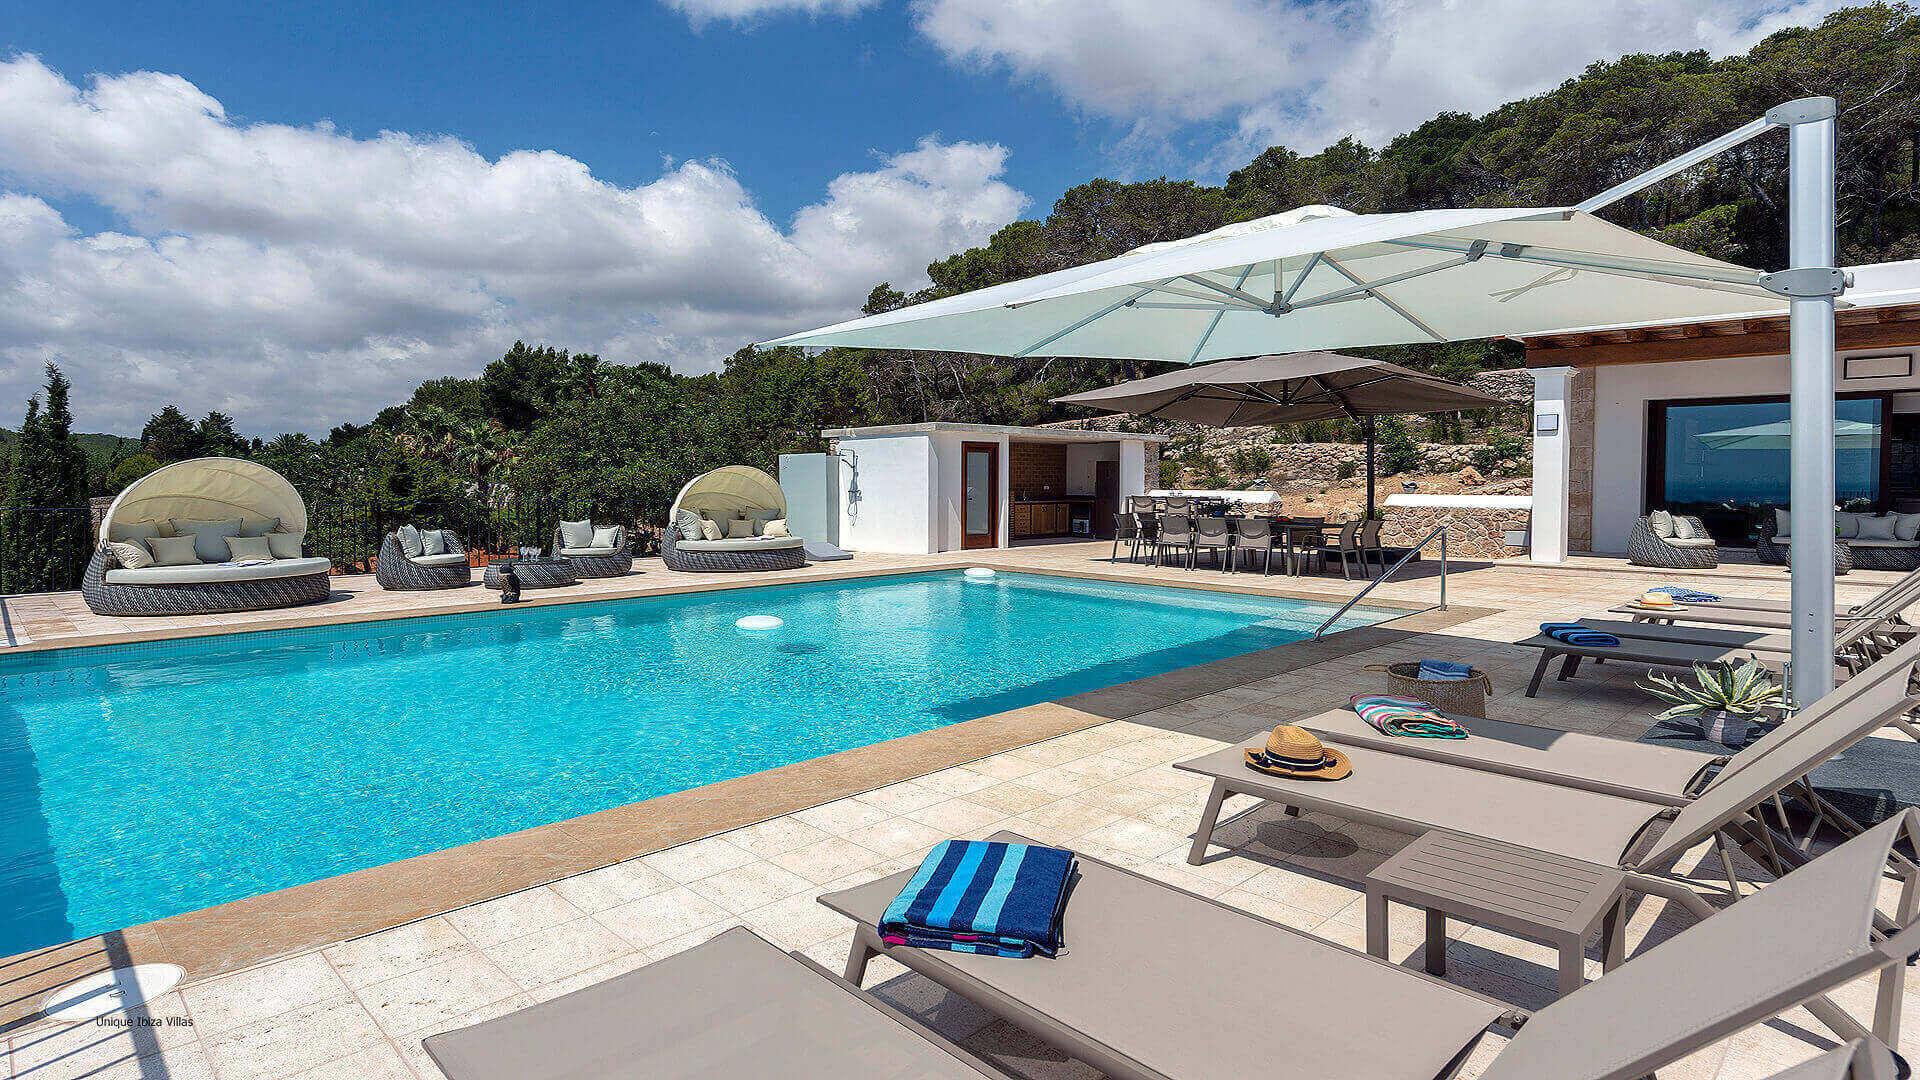 Casa Prats Ibiza 9 Santa Eulalia